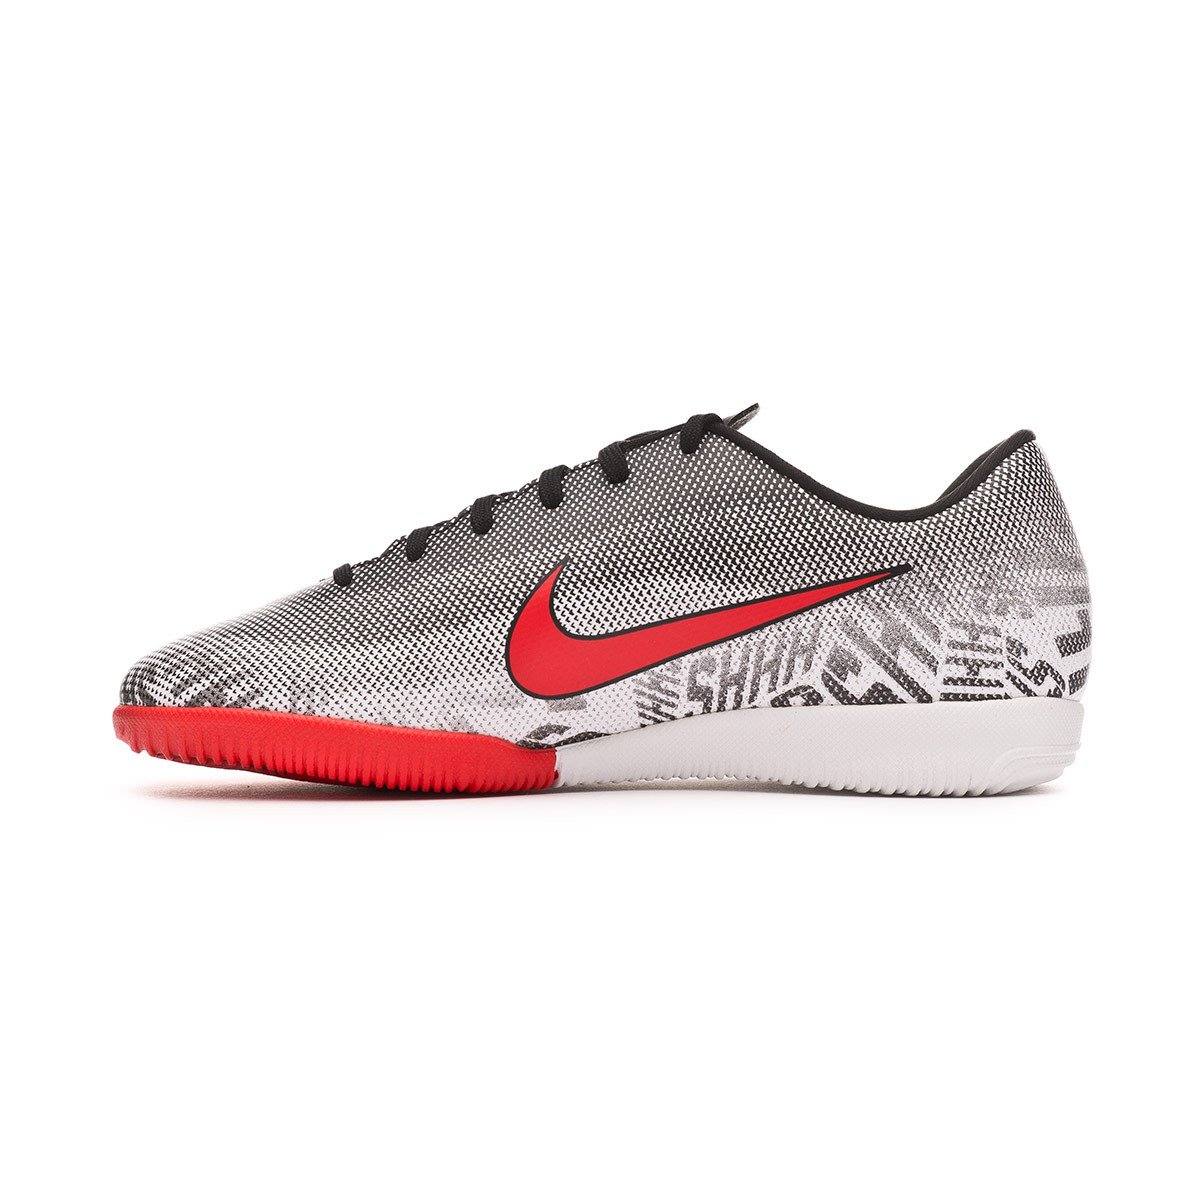 e857b49cd9b Futsal Boot Nike Mercurial VaporX XII Academy Neymar Jr IC Niño White- Challenge red-Black - Football store Fútbol Emotion